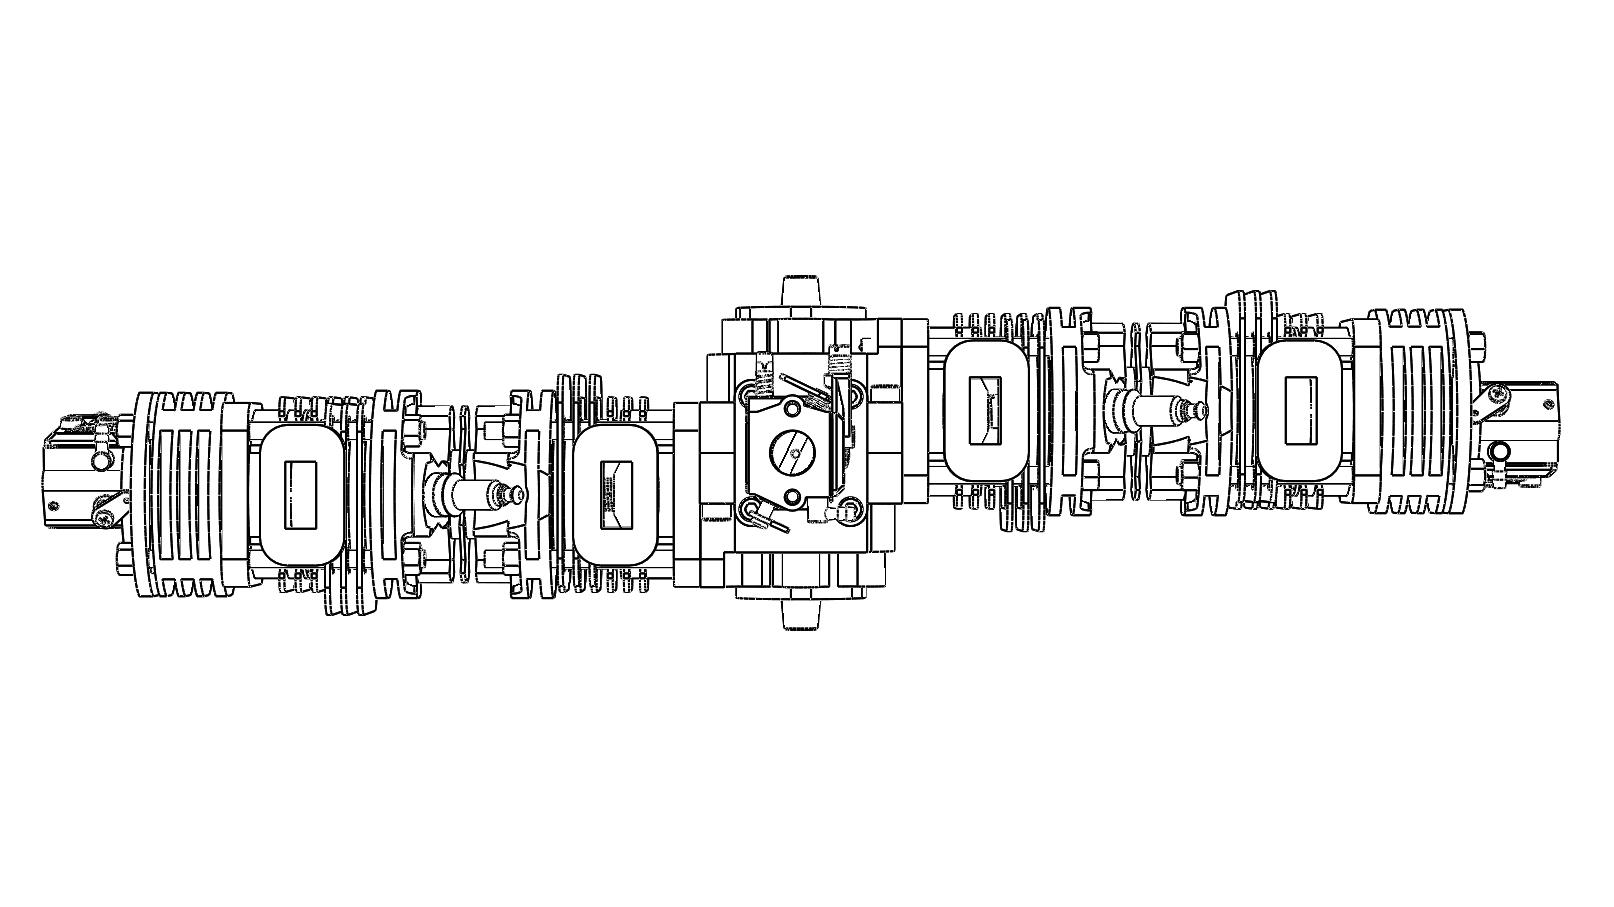 AMP SS-2B 200CC A szkic3.png